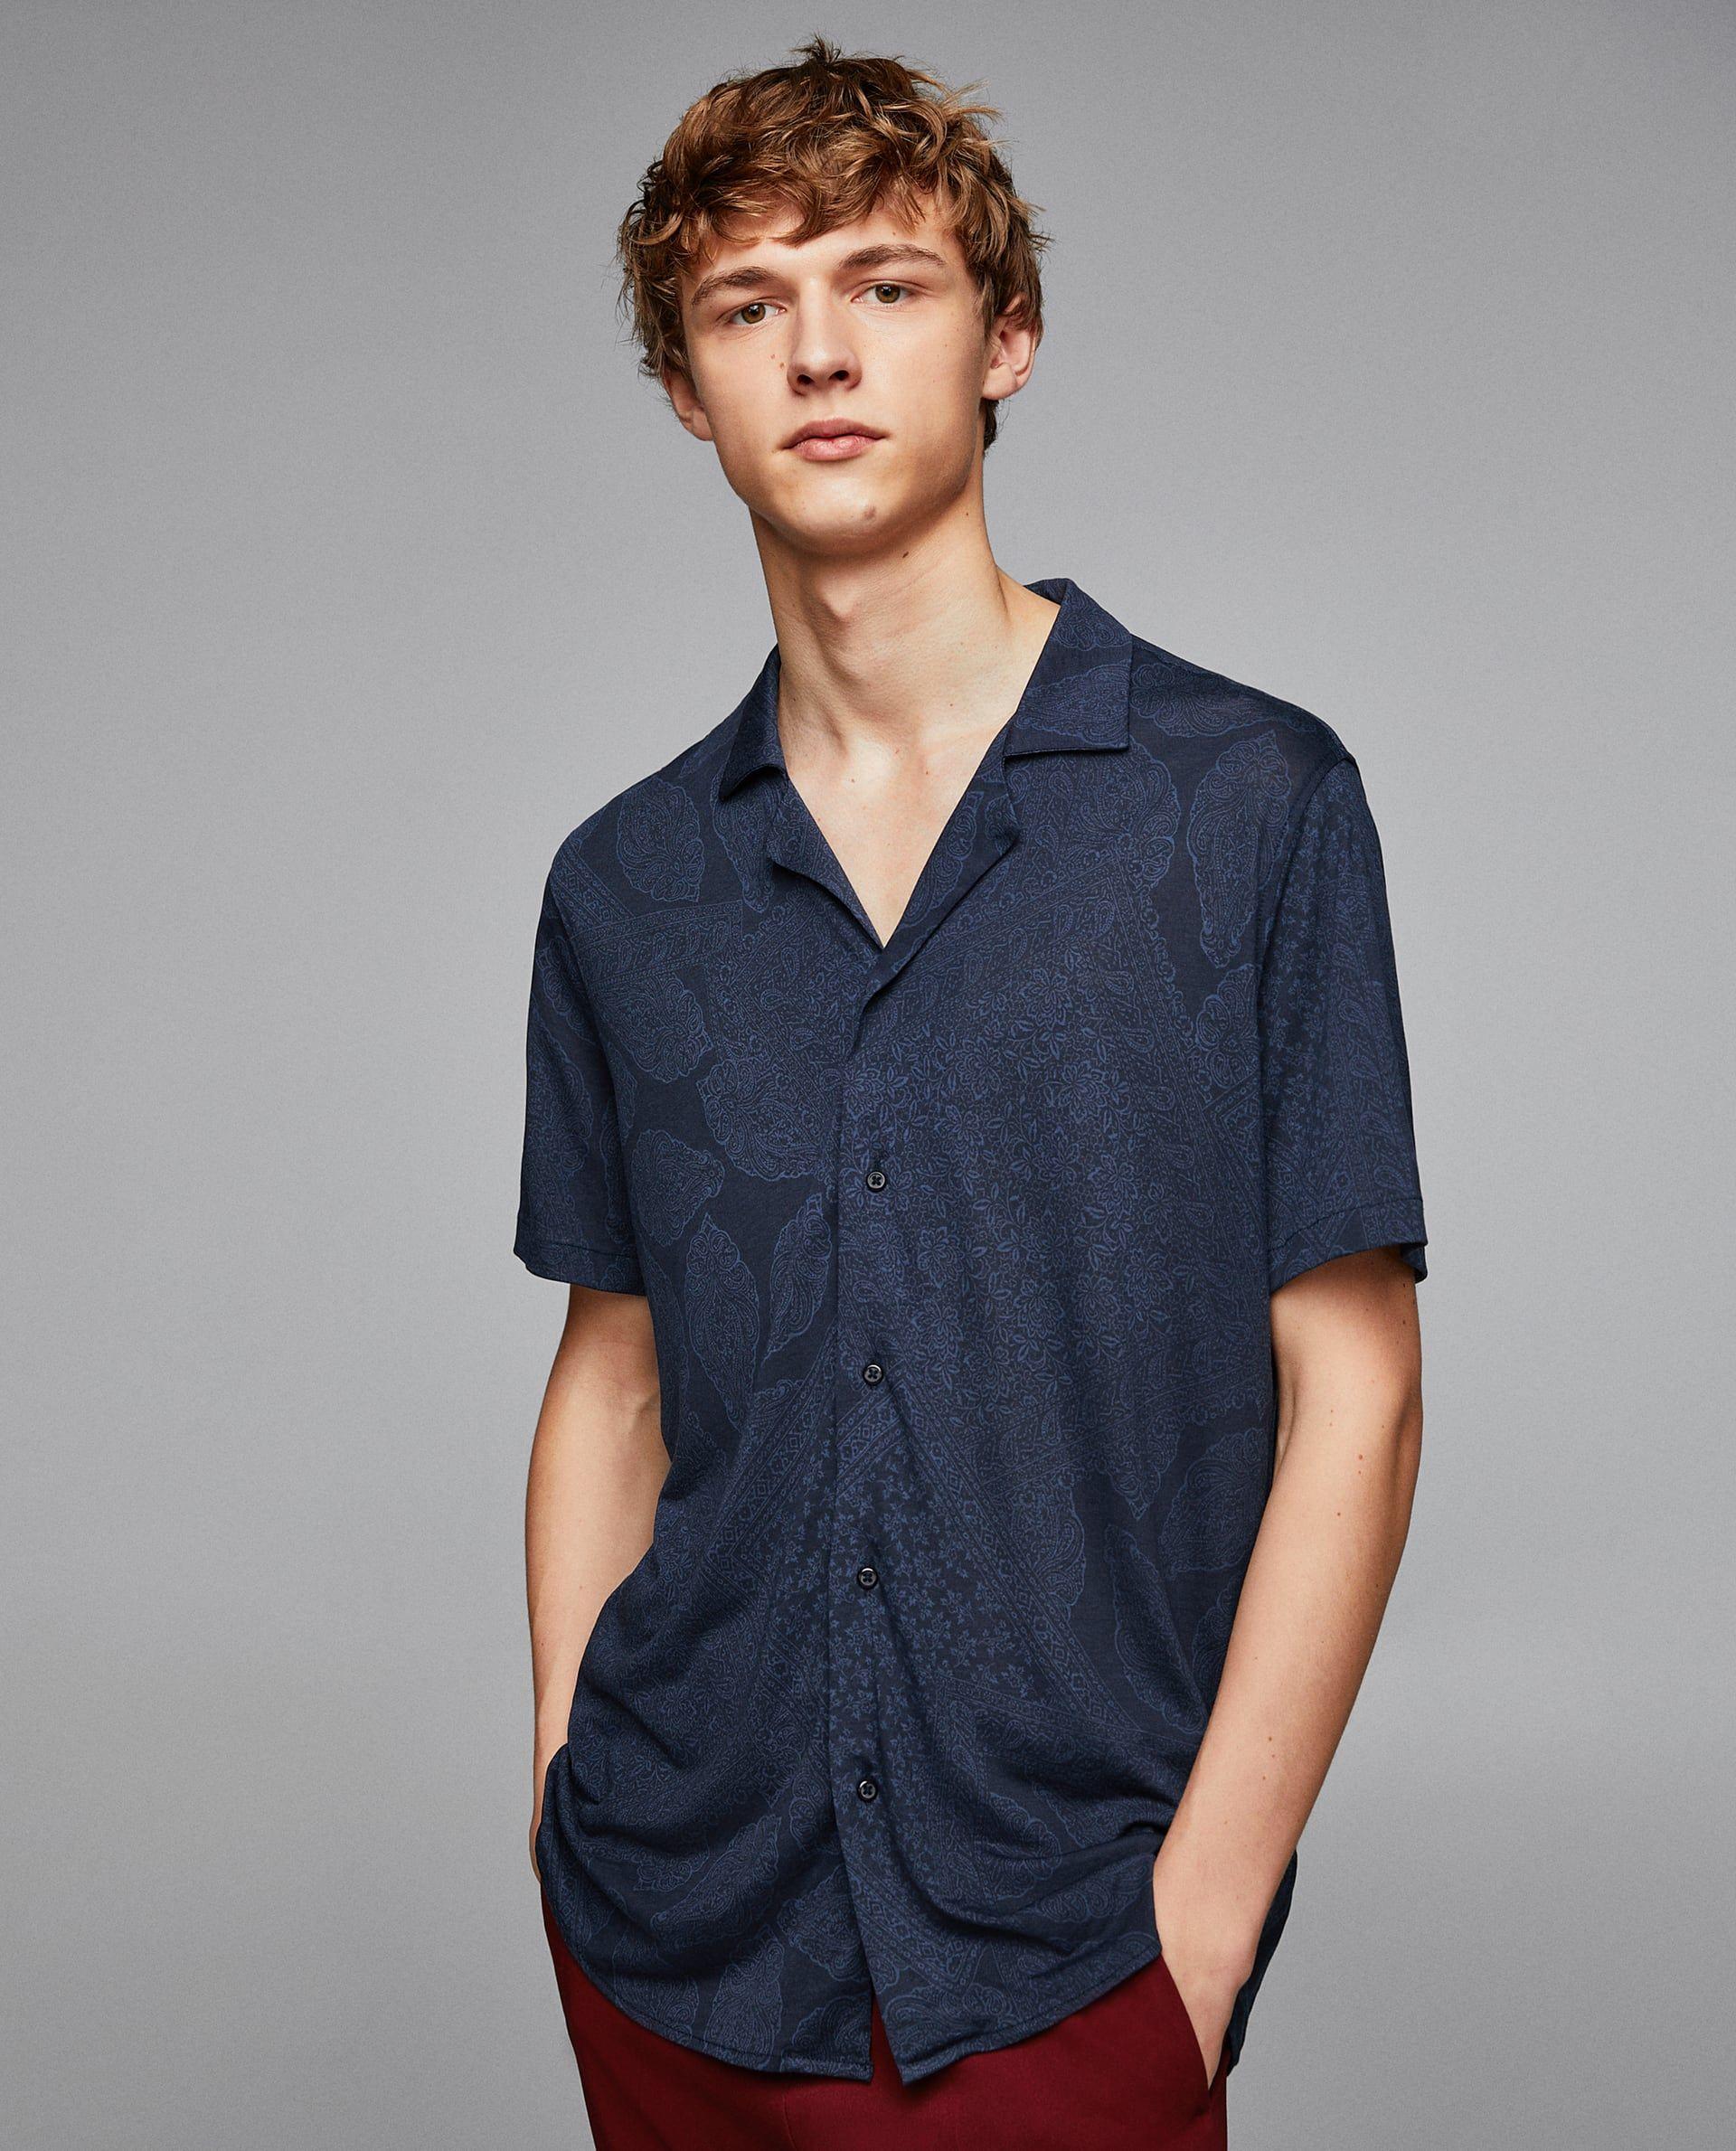 2019 De 2 Camisa Zara Fluida En Graficos Imagen Estampada 8q5dqw